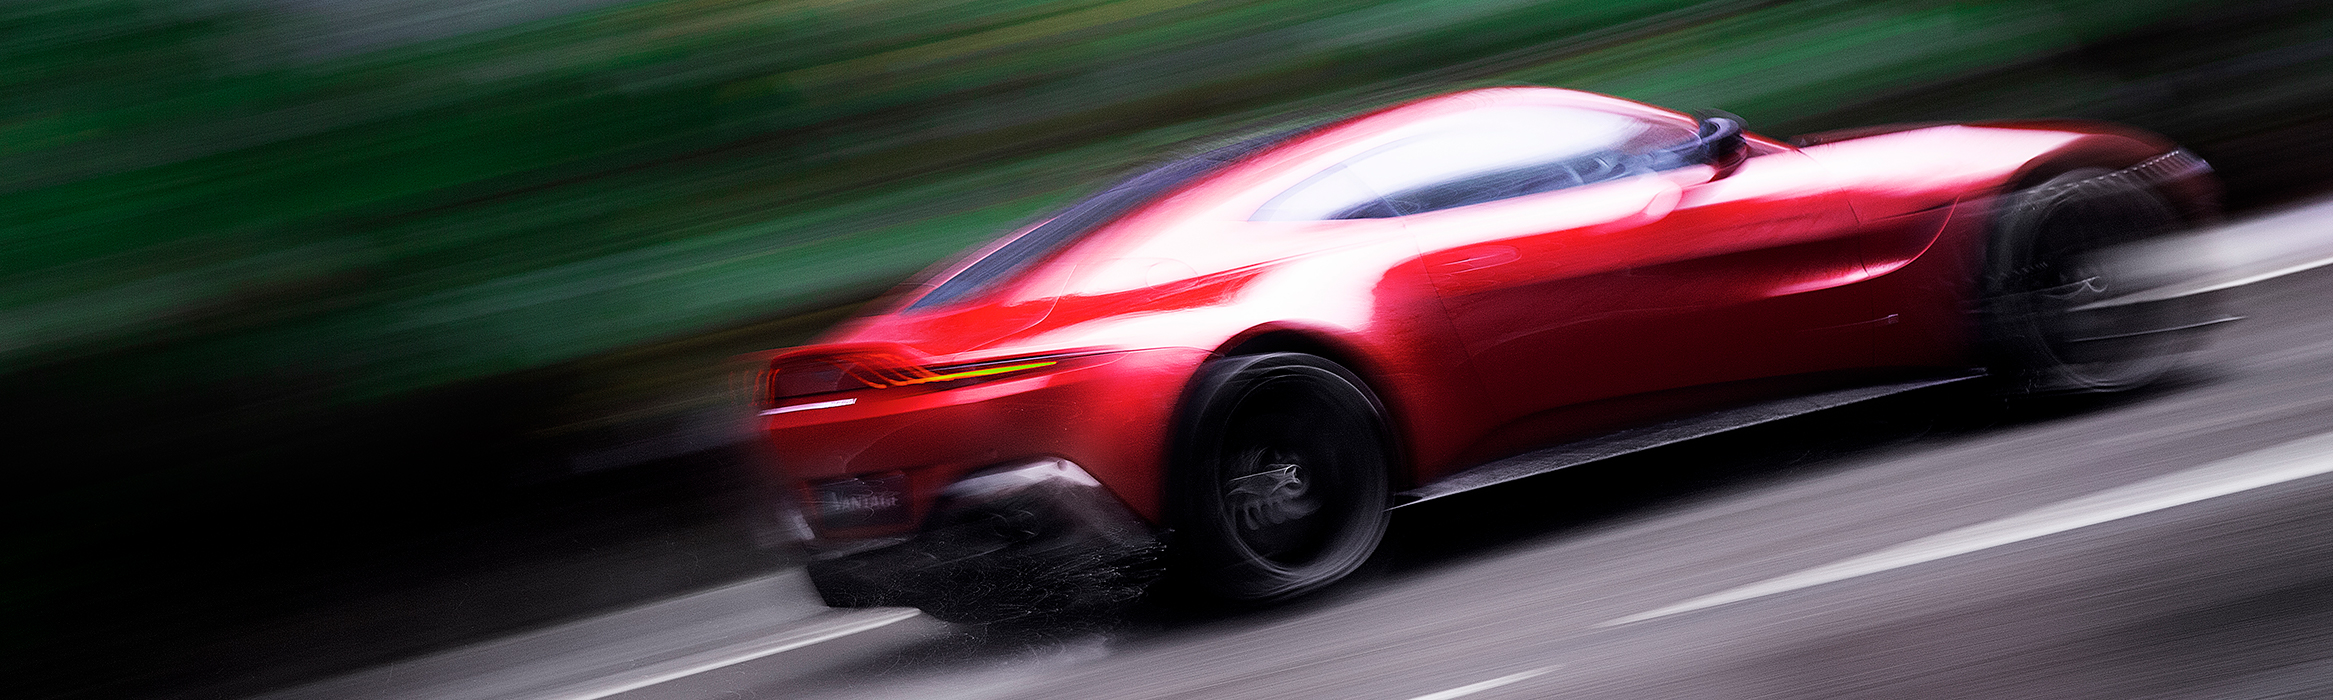 Aston Martin Financial Services キックオフ 低金利 キャンペーン